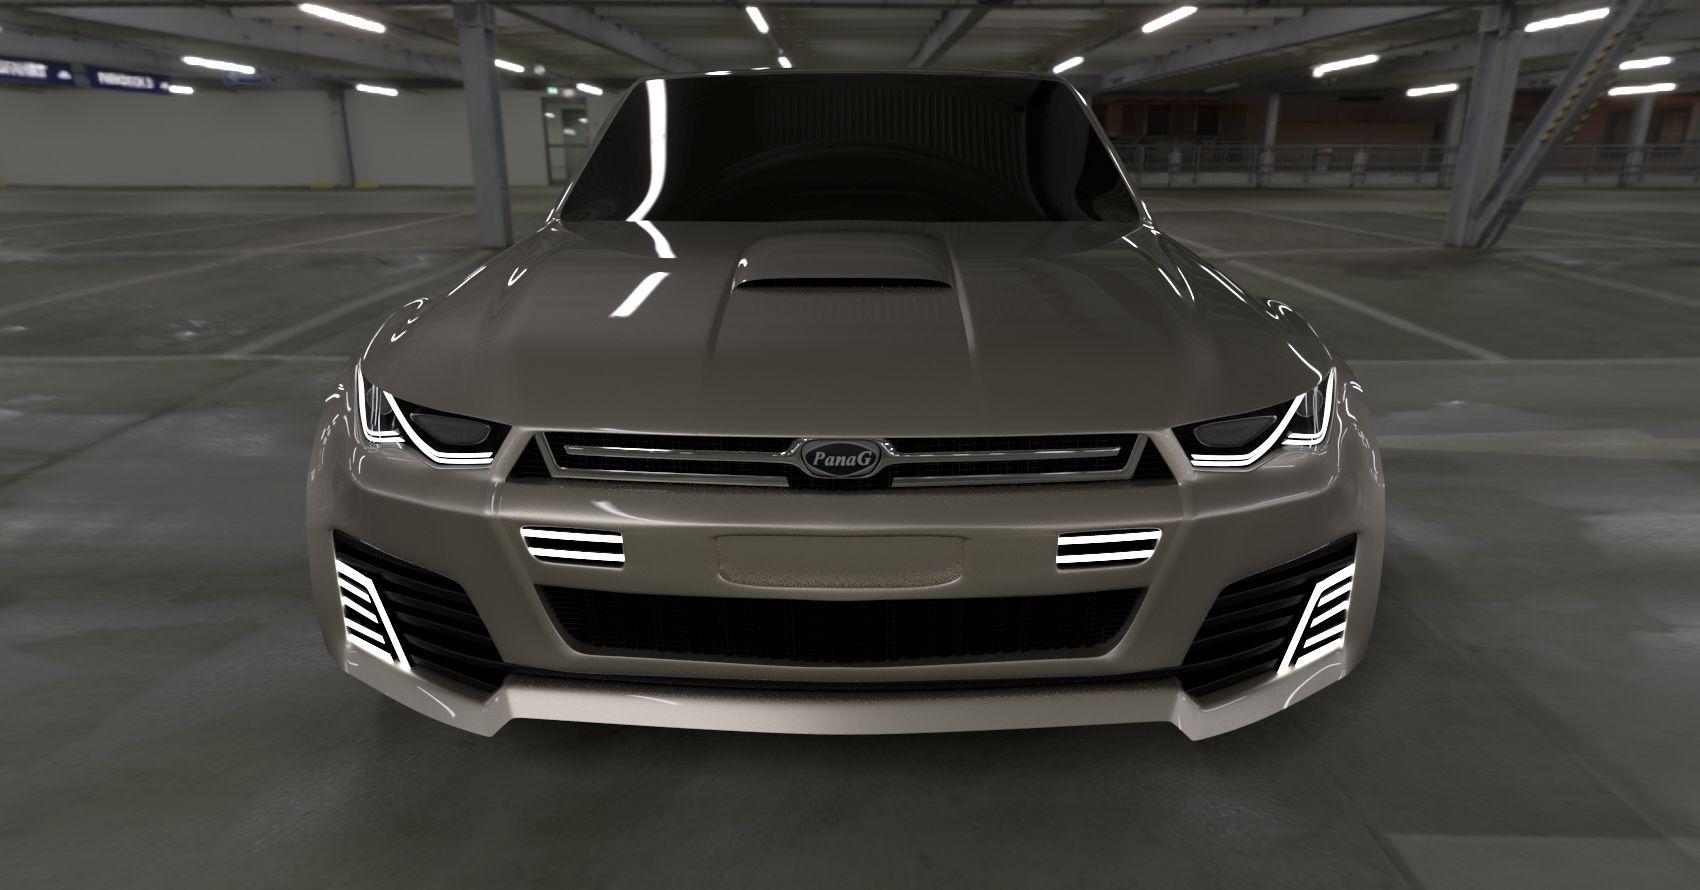 Mustang-hatch4-3500-3500